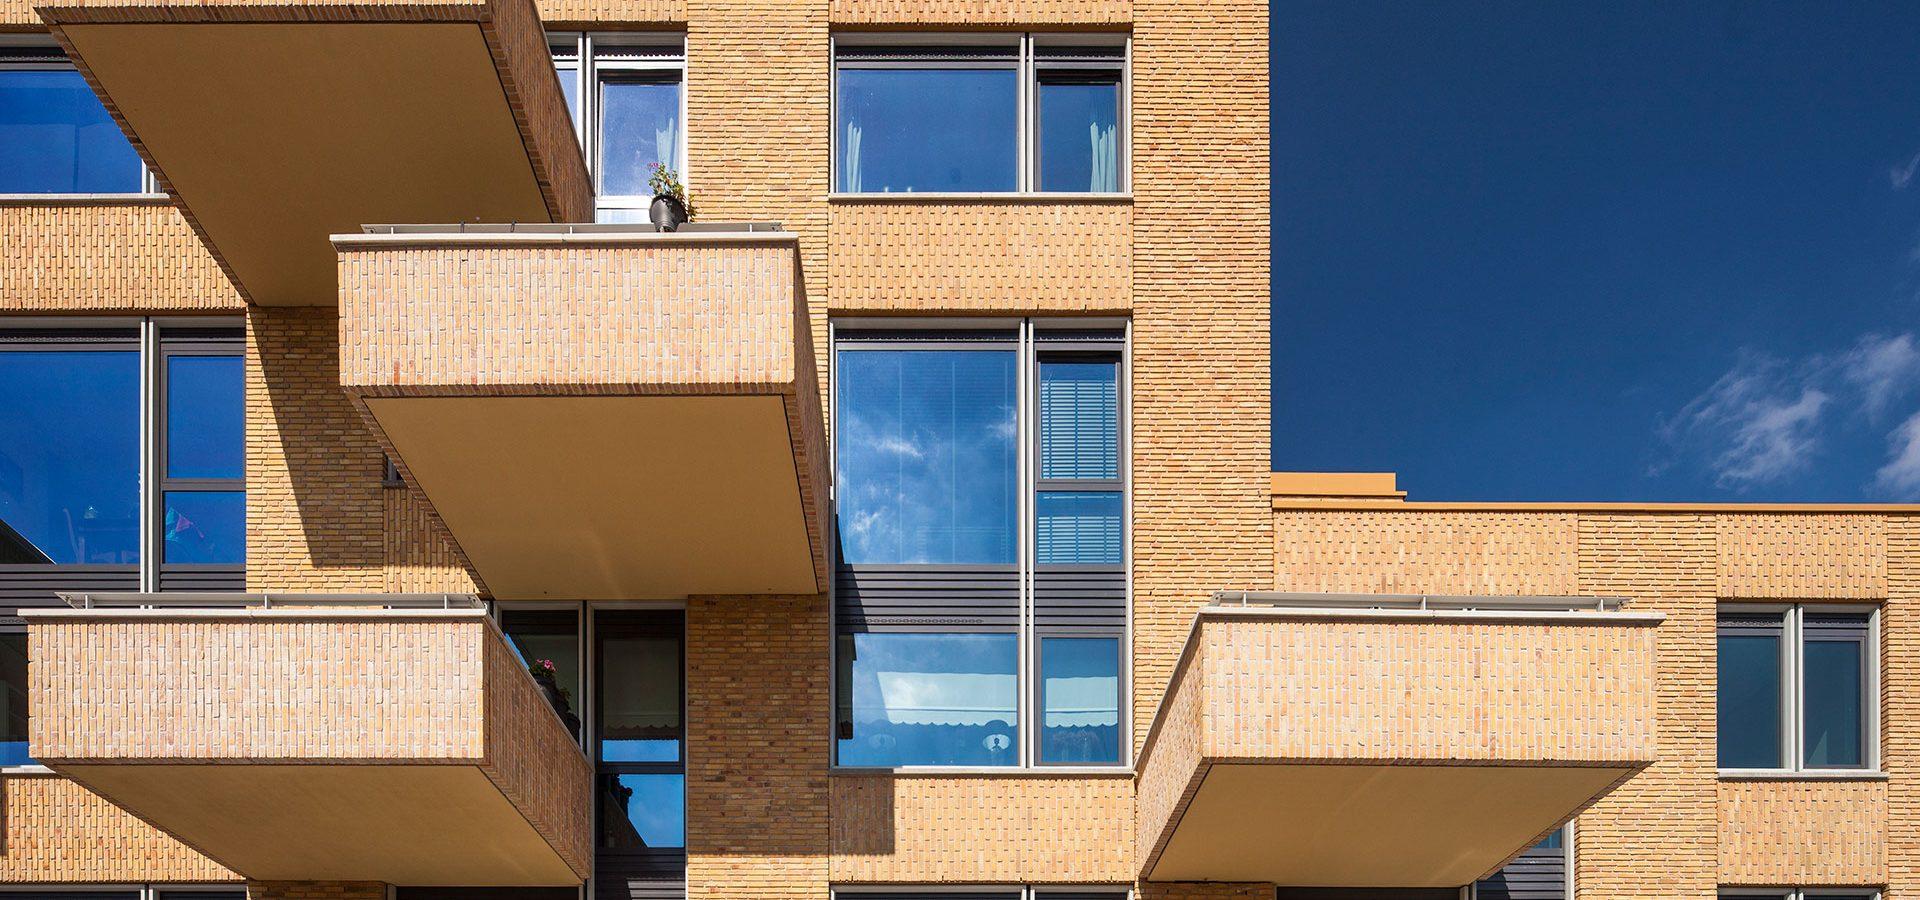 FARO architecten 't Zand Leidsche Rijn Utrecht 05